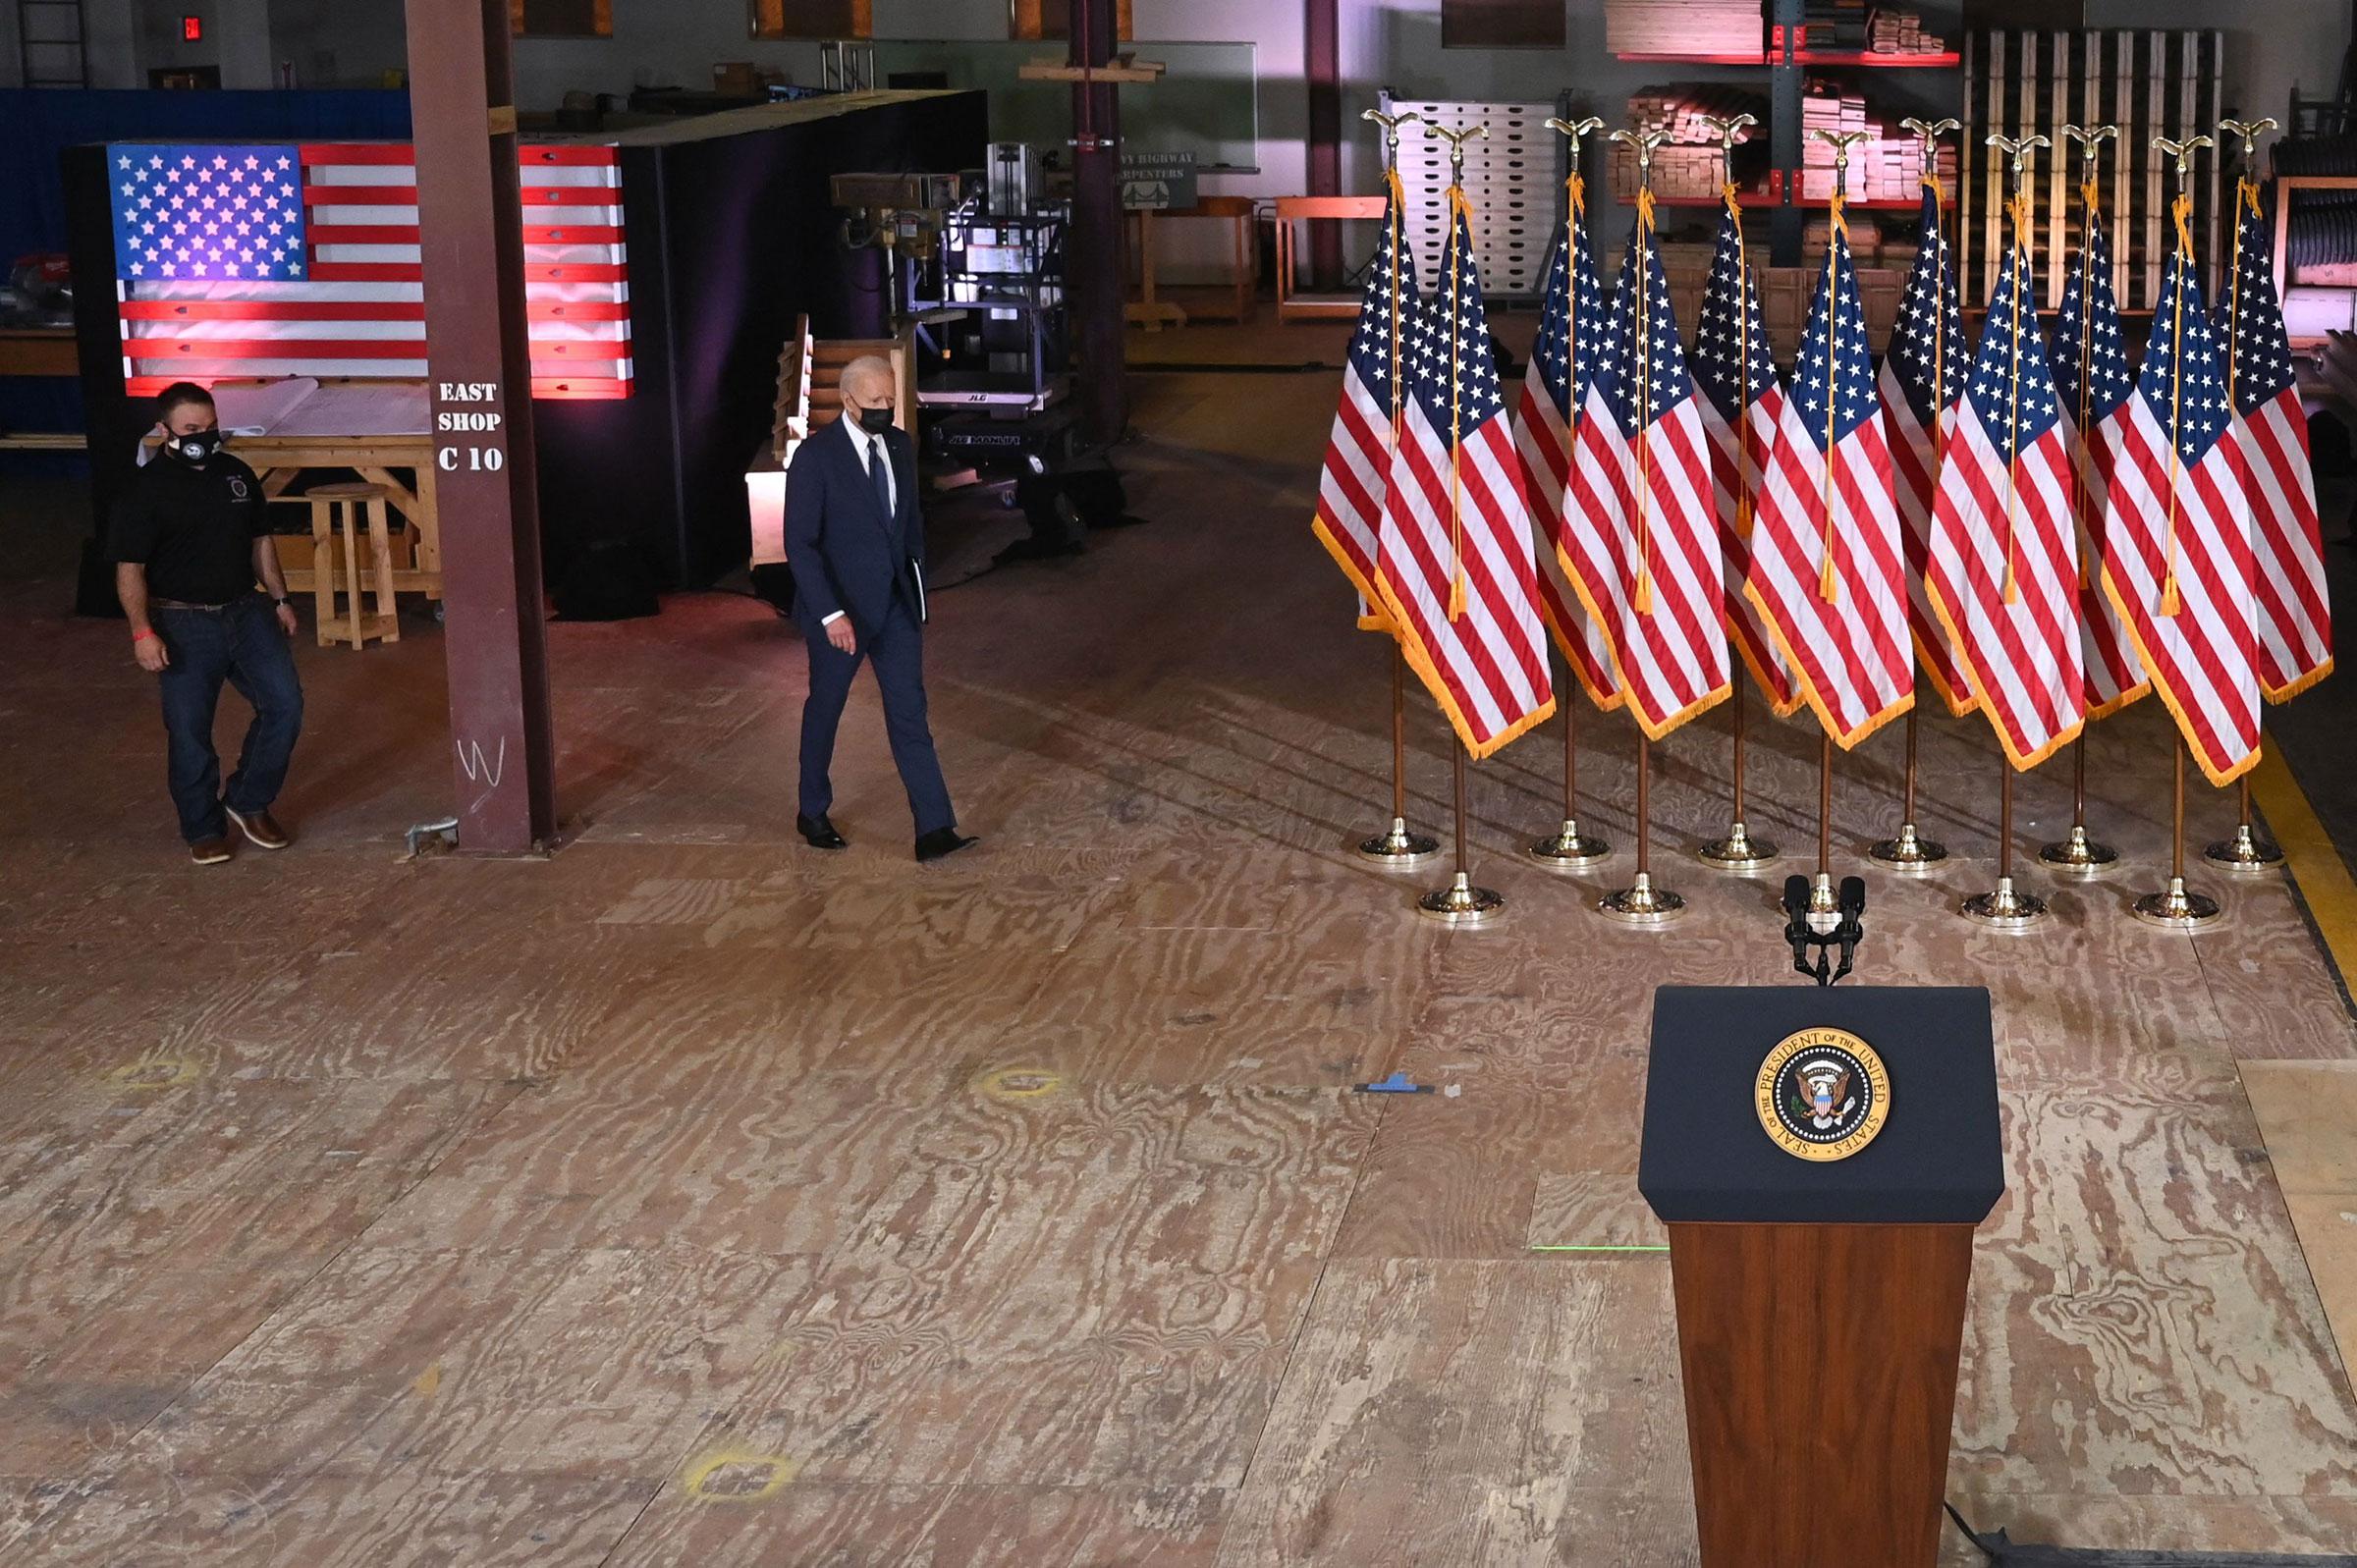 President Joe Biden walks to the lectern before speaking in Pittsburgh, Pa. on March 31, 2021.